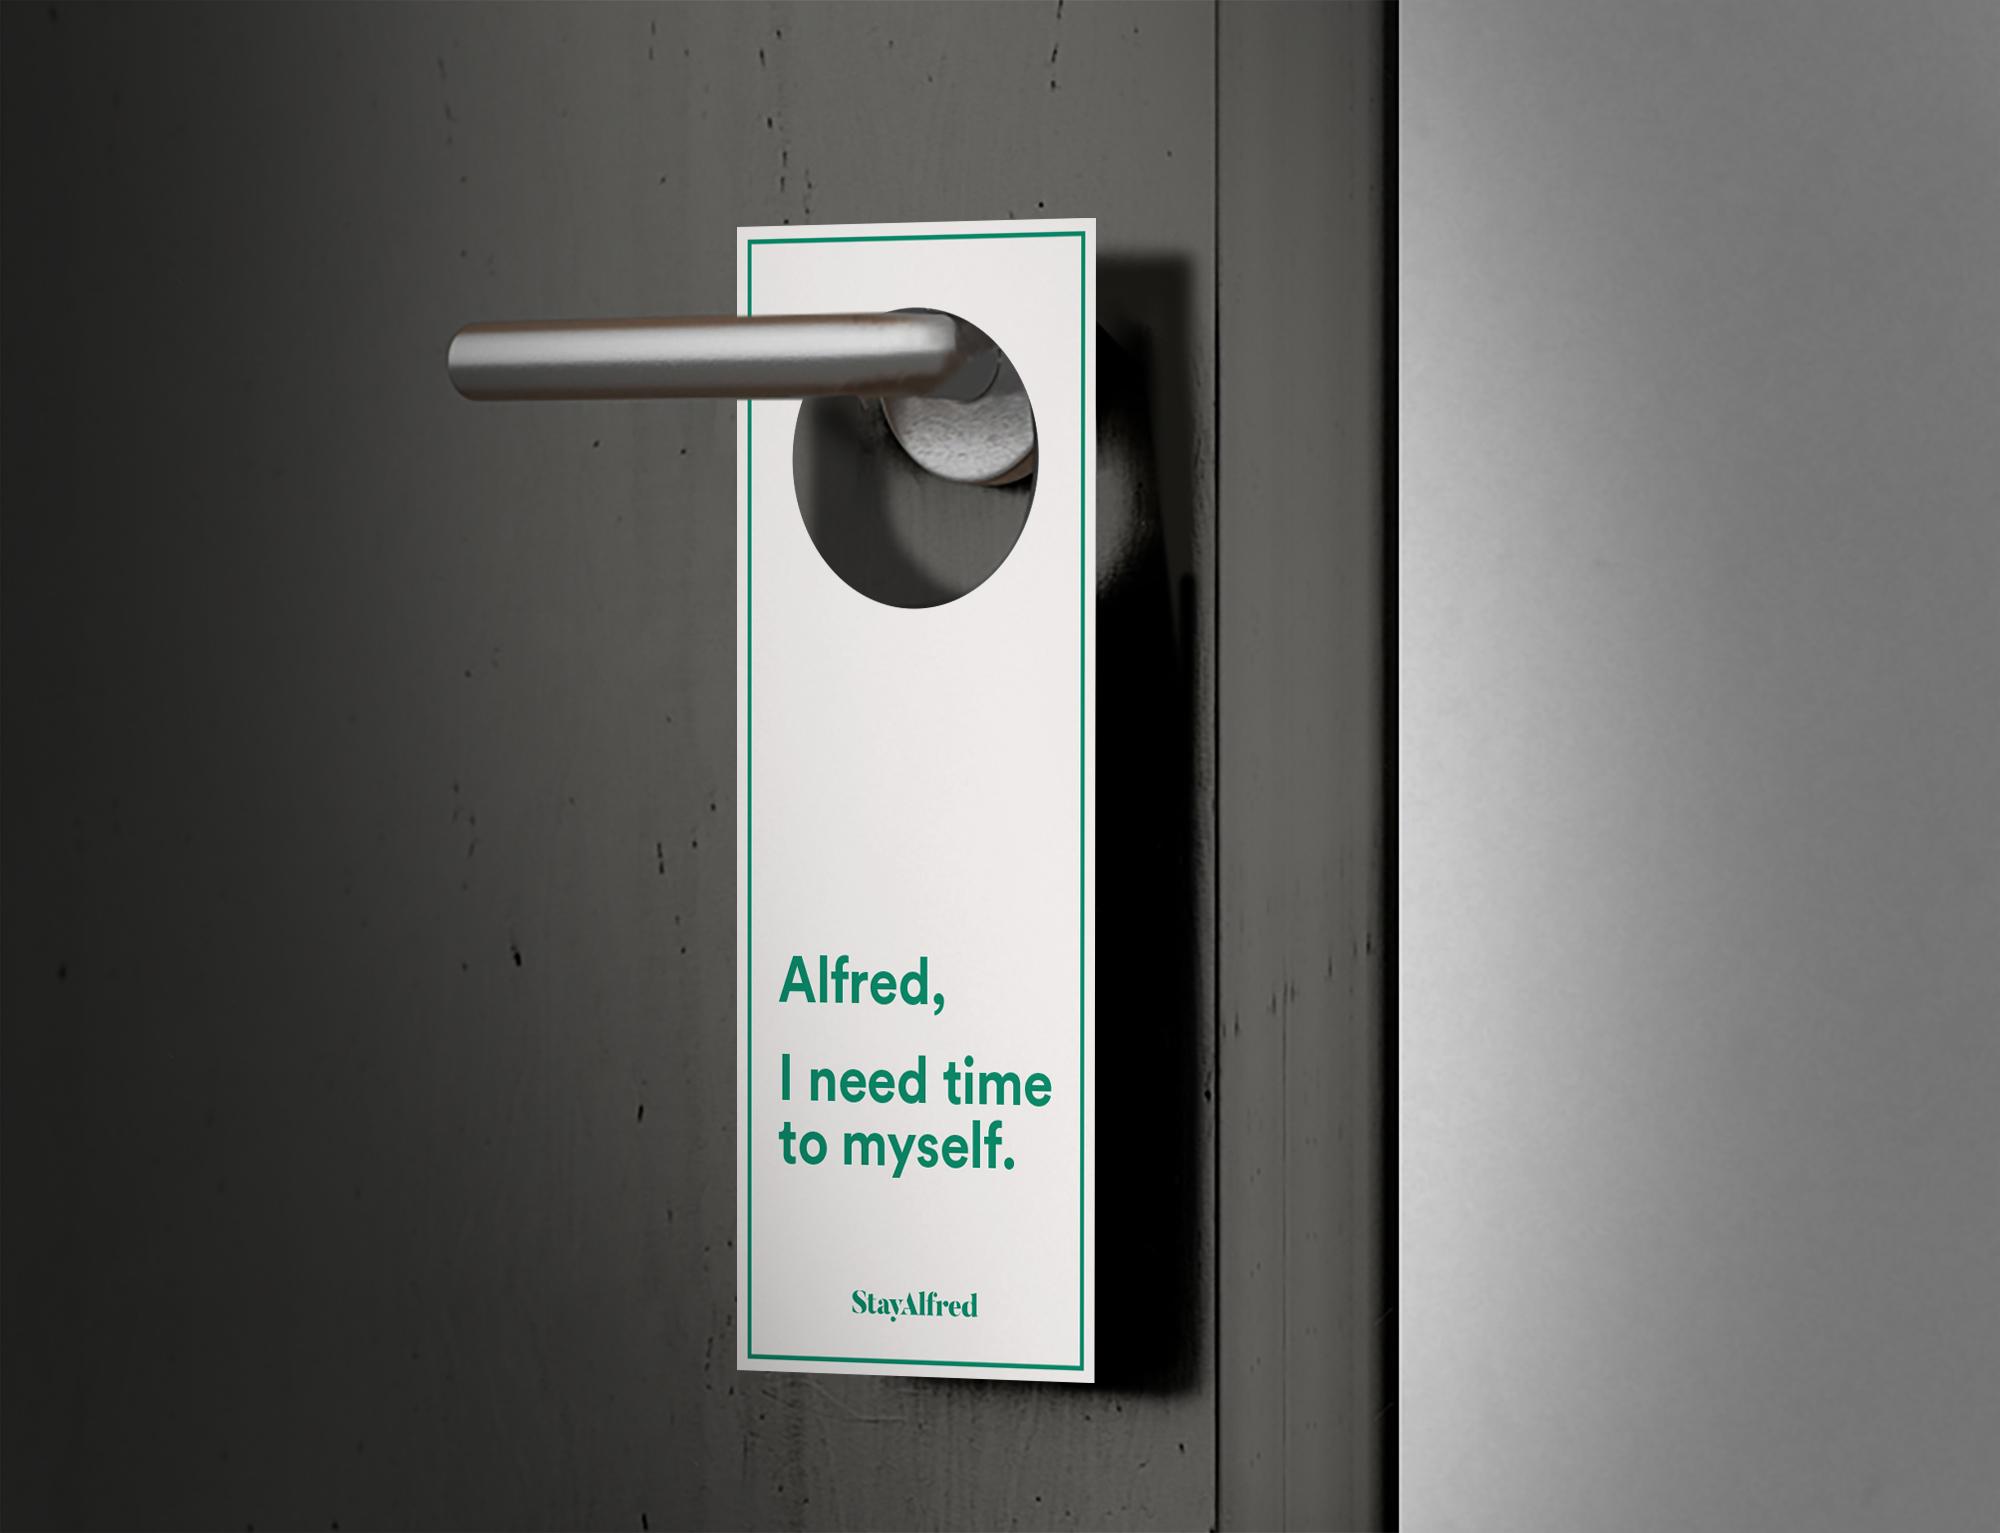 StayAflred-doorhanger2.jpg